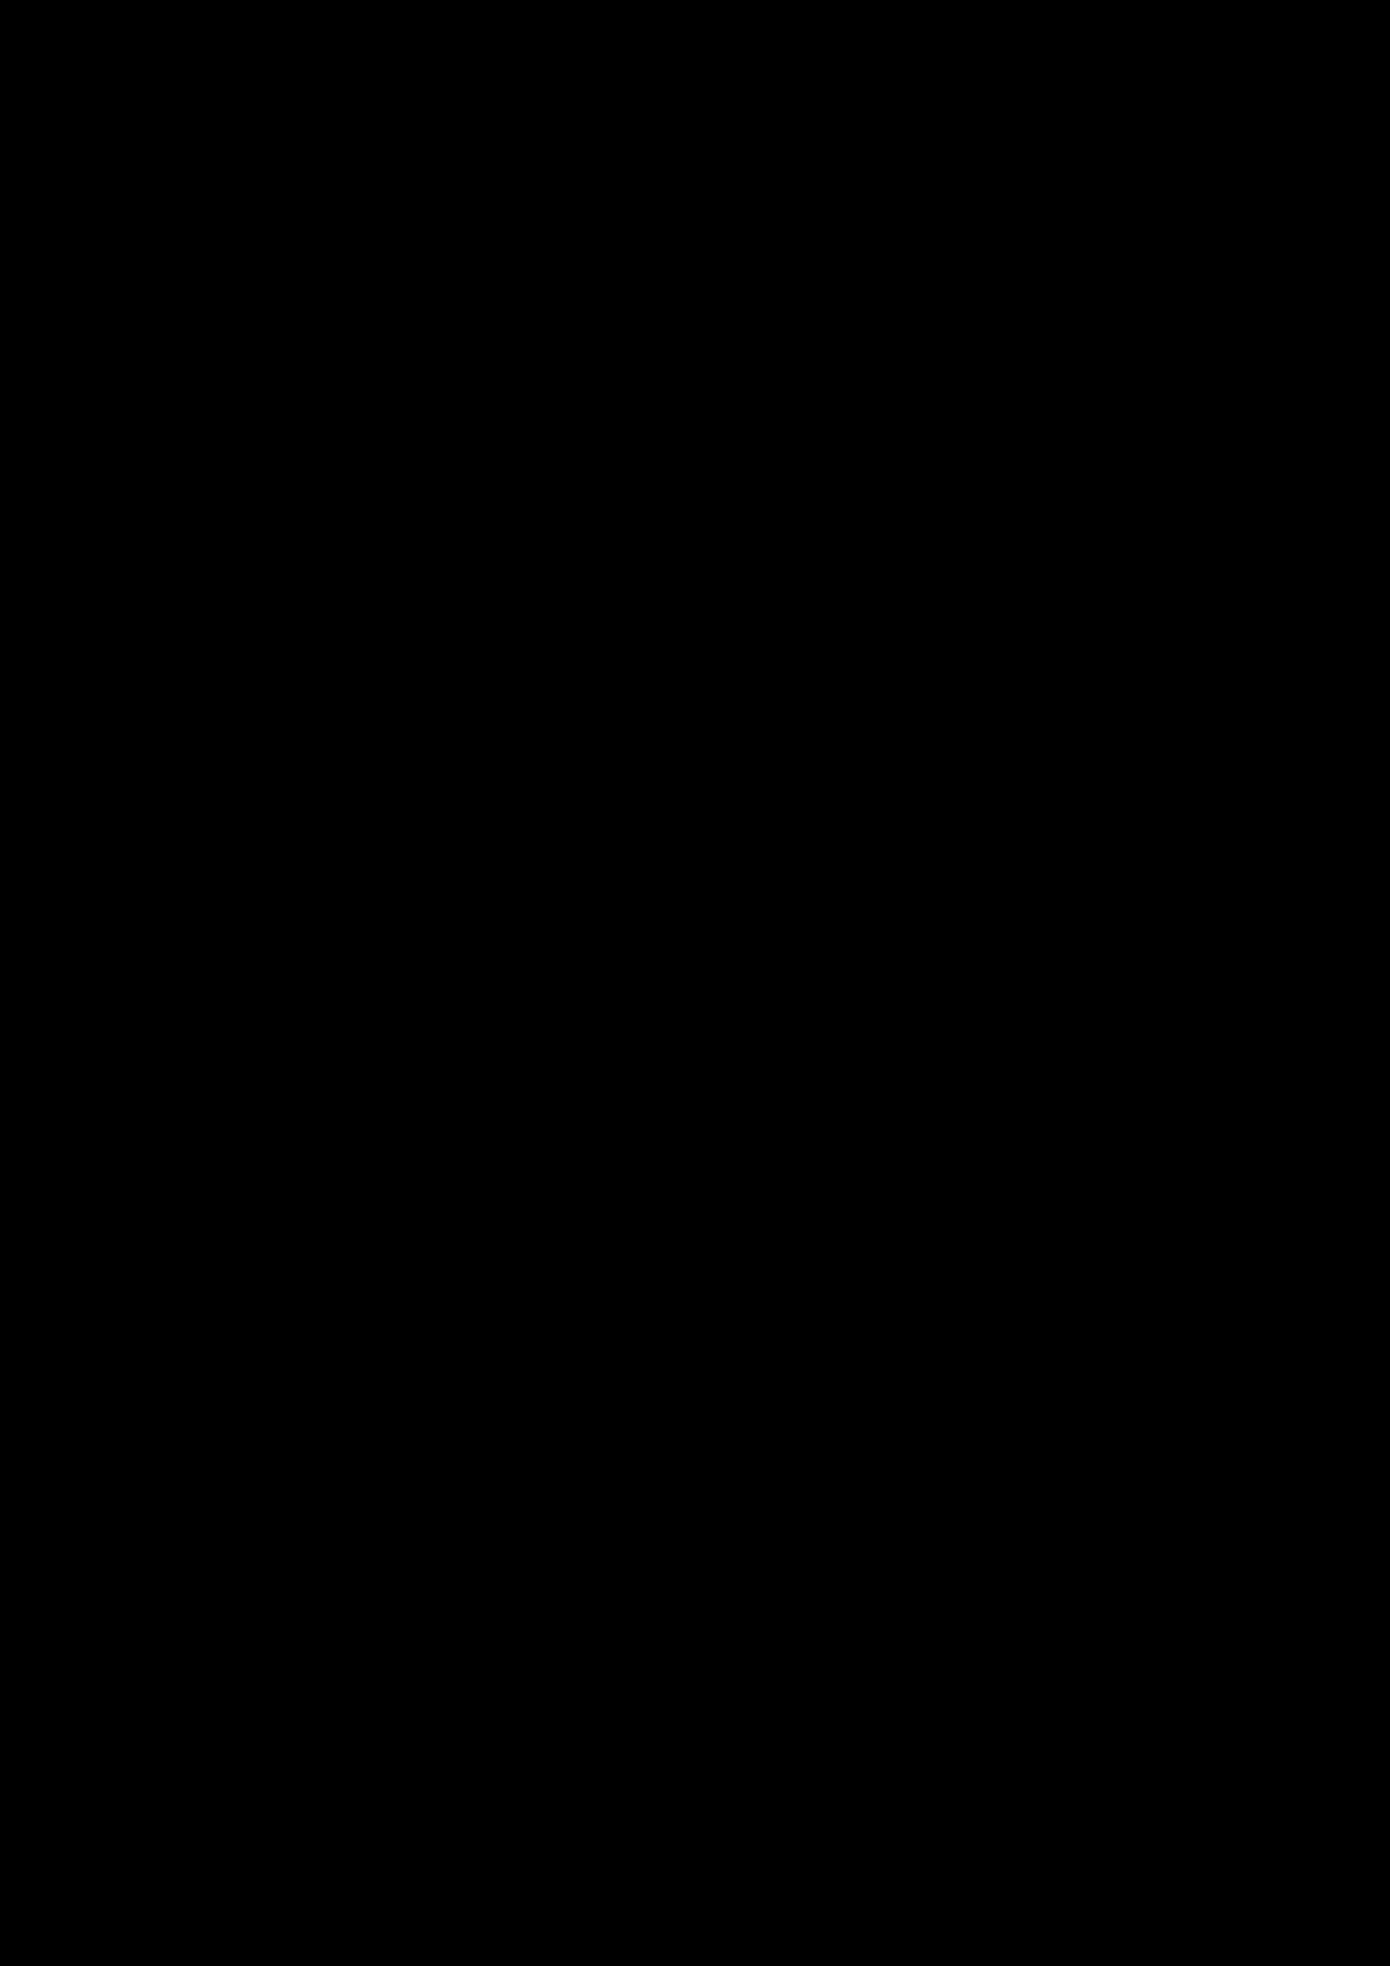 Drullumall í Iðnó 17. apríl